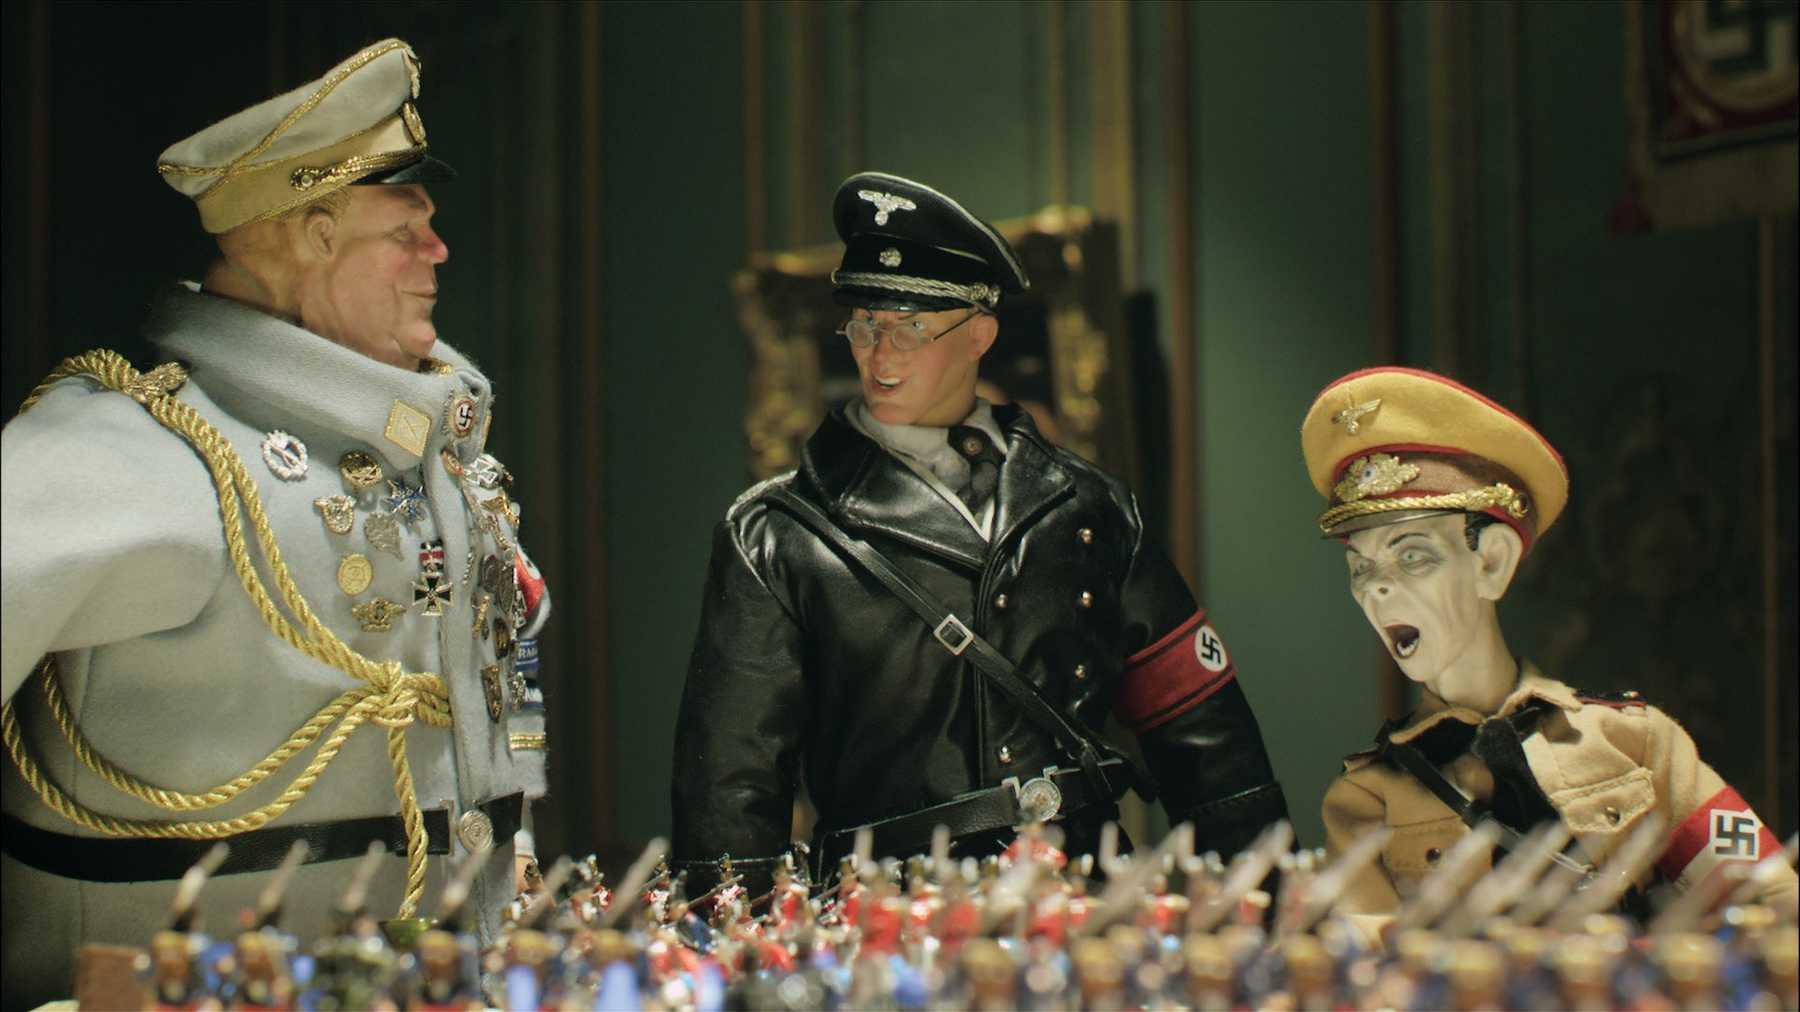 The Nazi leadership plot the invasion of England in Jackboots on Whitehall (2010)